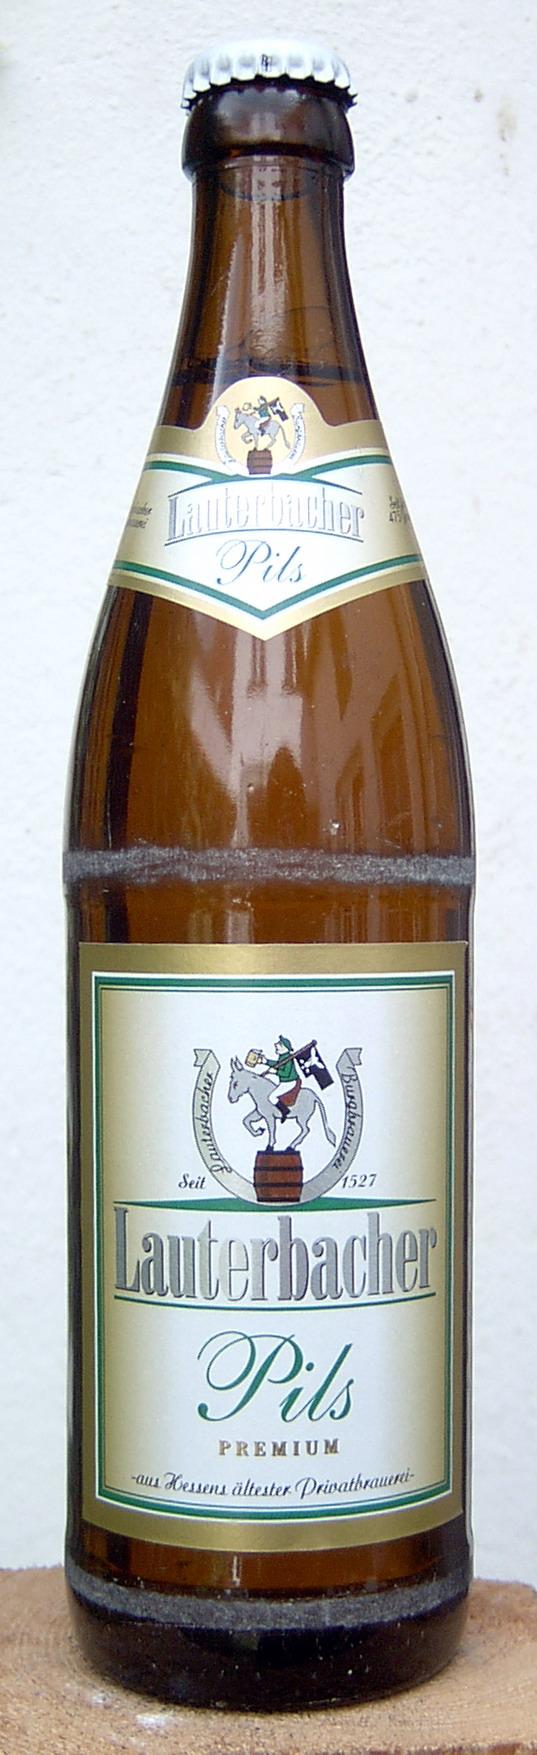 Lauterbacher Bier